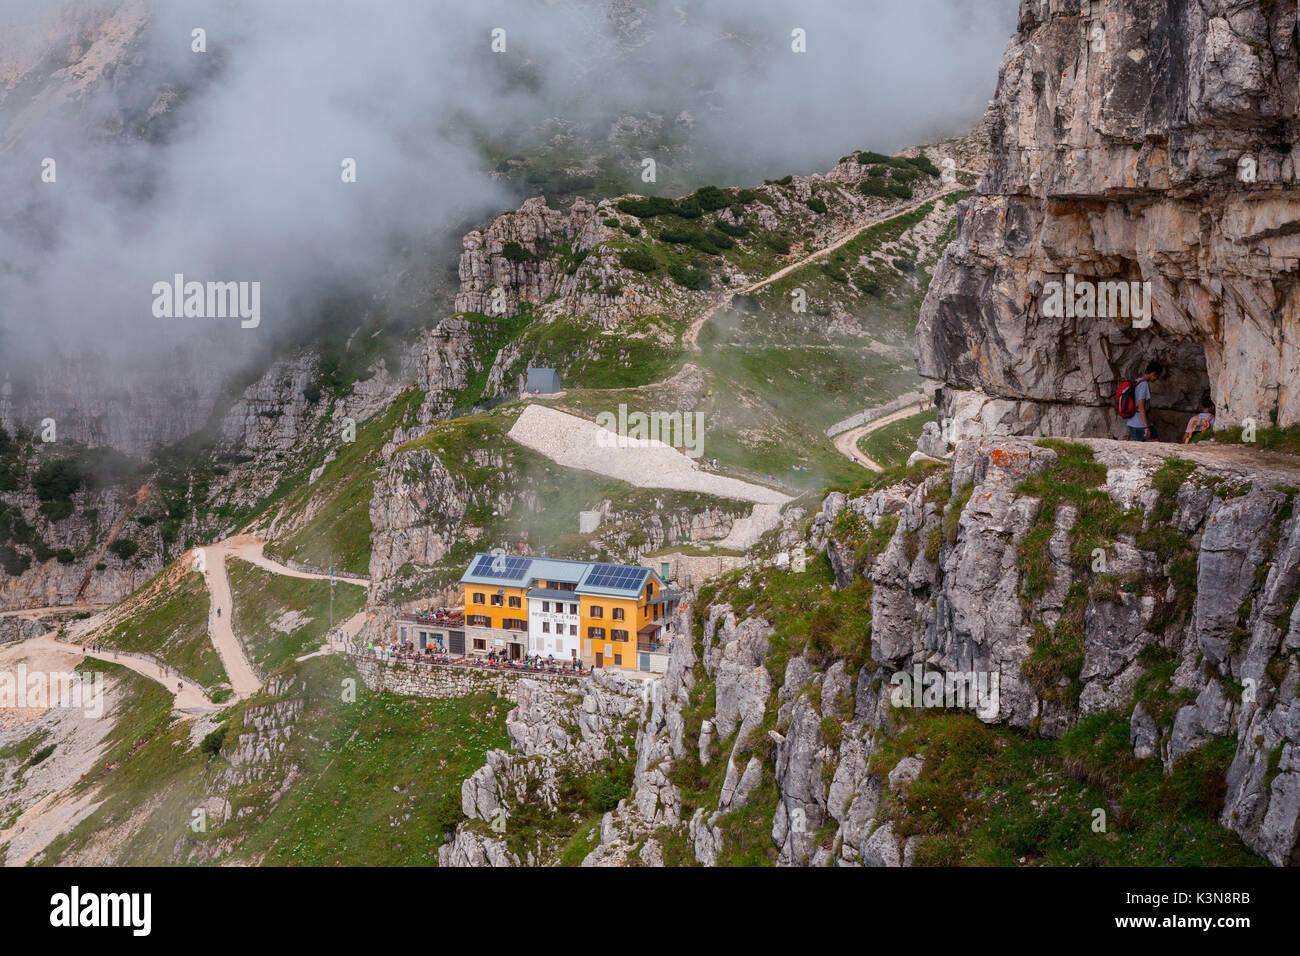 Papa refuge, Veneto, Italie. Papa refuge du 52 galeries de Pasubio mountain Photo Stock